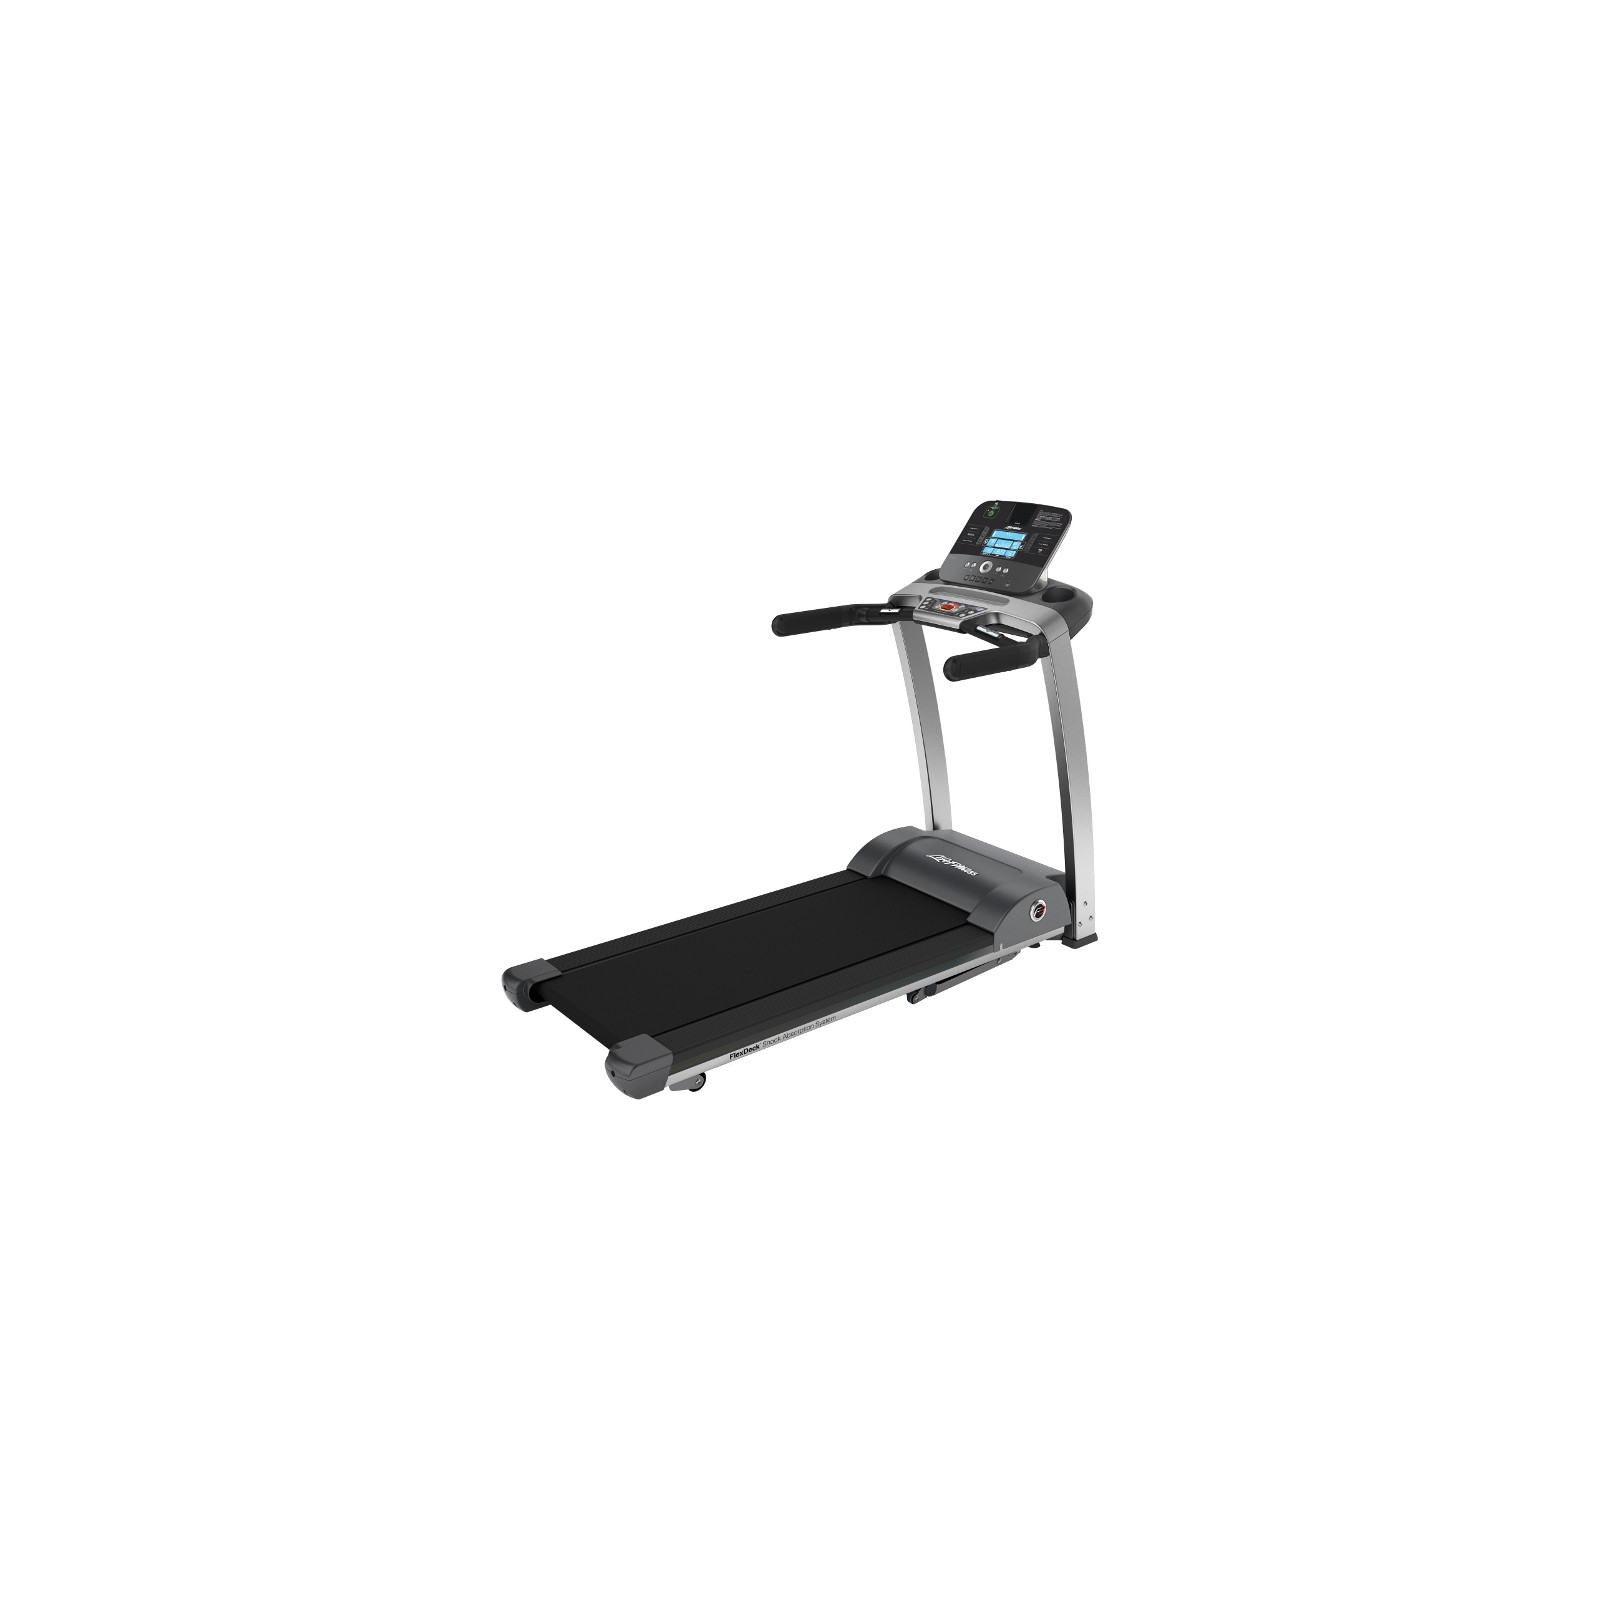 life fitness laufband f3 mit track plus konsole kaufen test sport tiedje. Black Bedroom Furniture Sets. Home Design Ideas